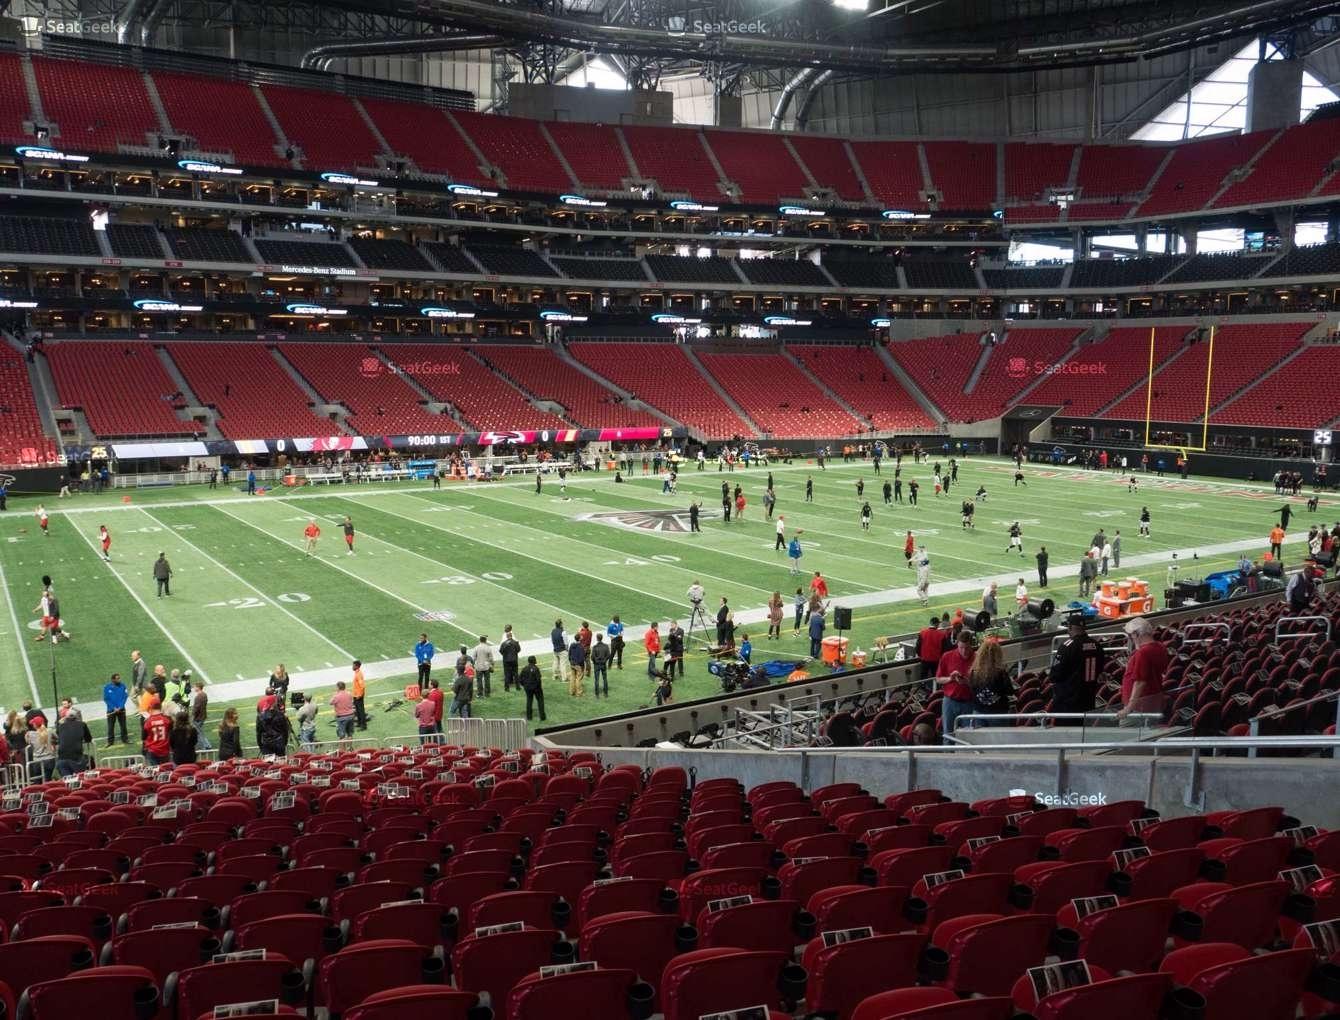 Mercedes-Benz Stadium Section 131 Seat Views | Seatgeek inside Mercedes Benz Stadium Seating Chart For Super Bowl